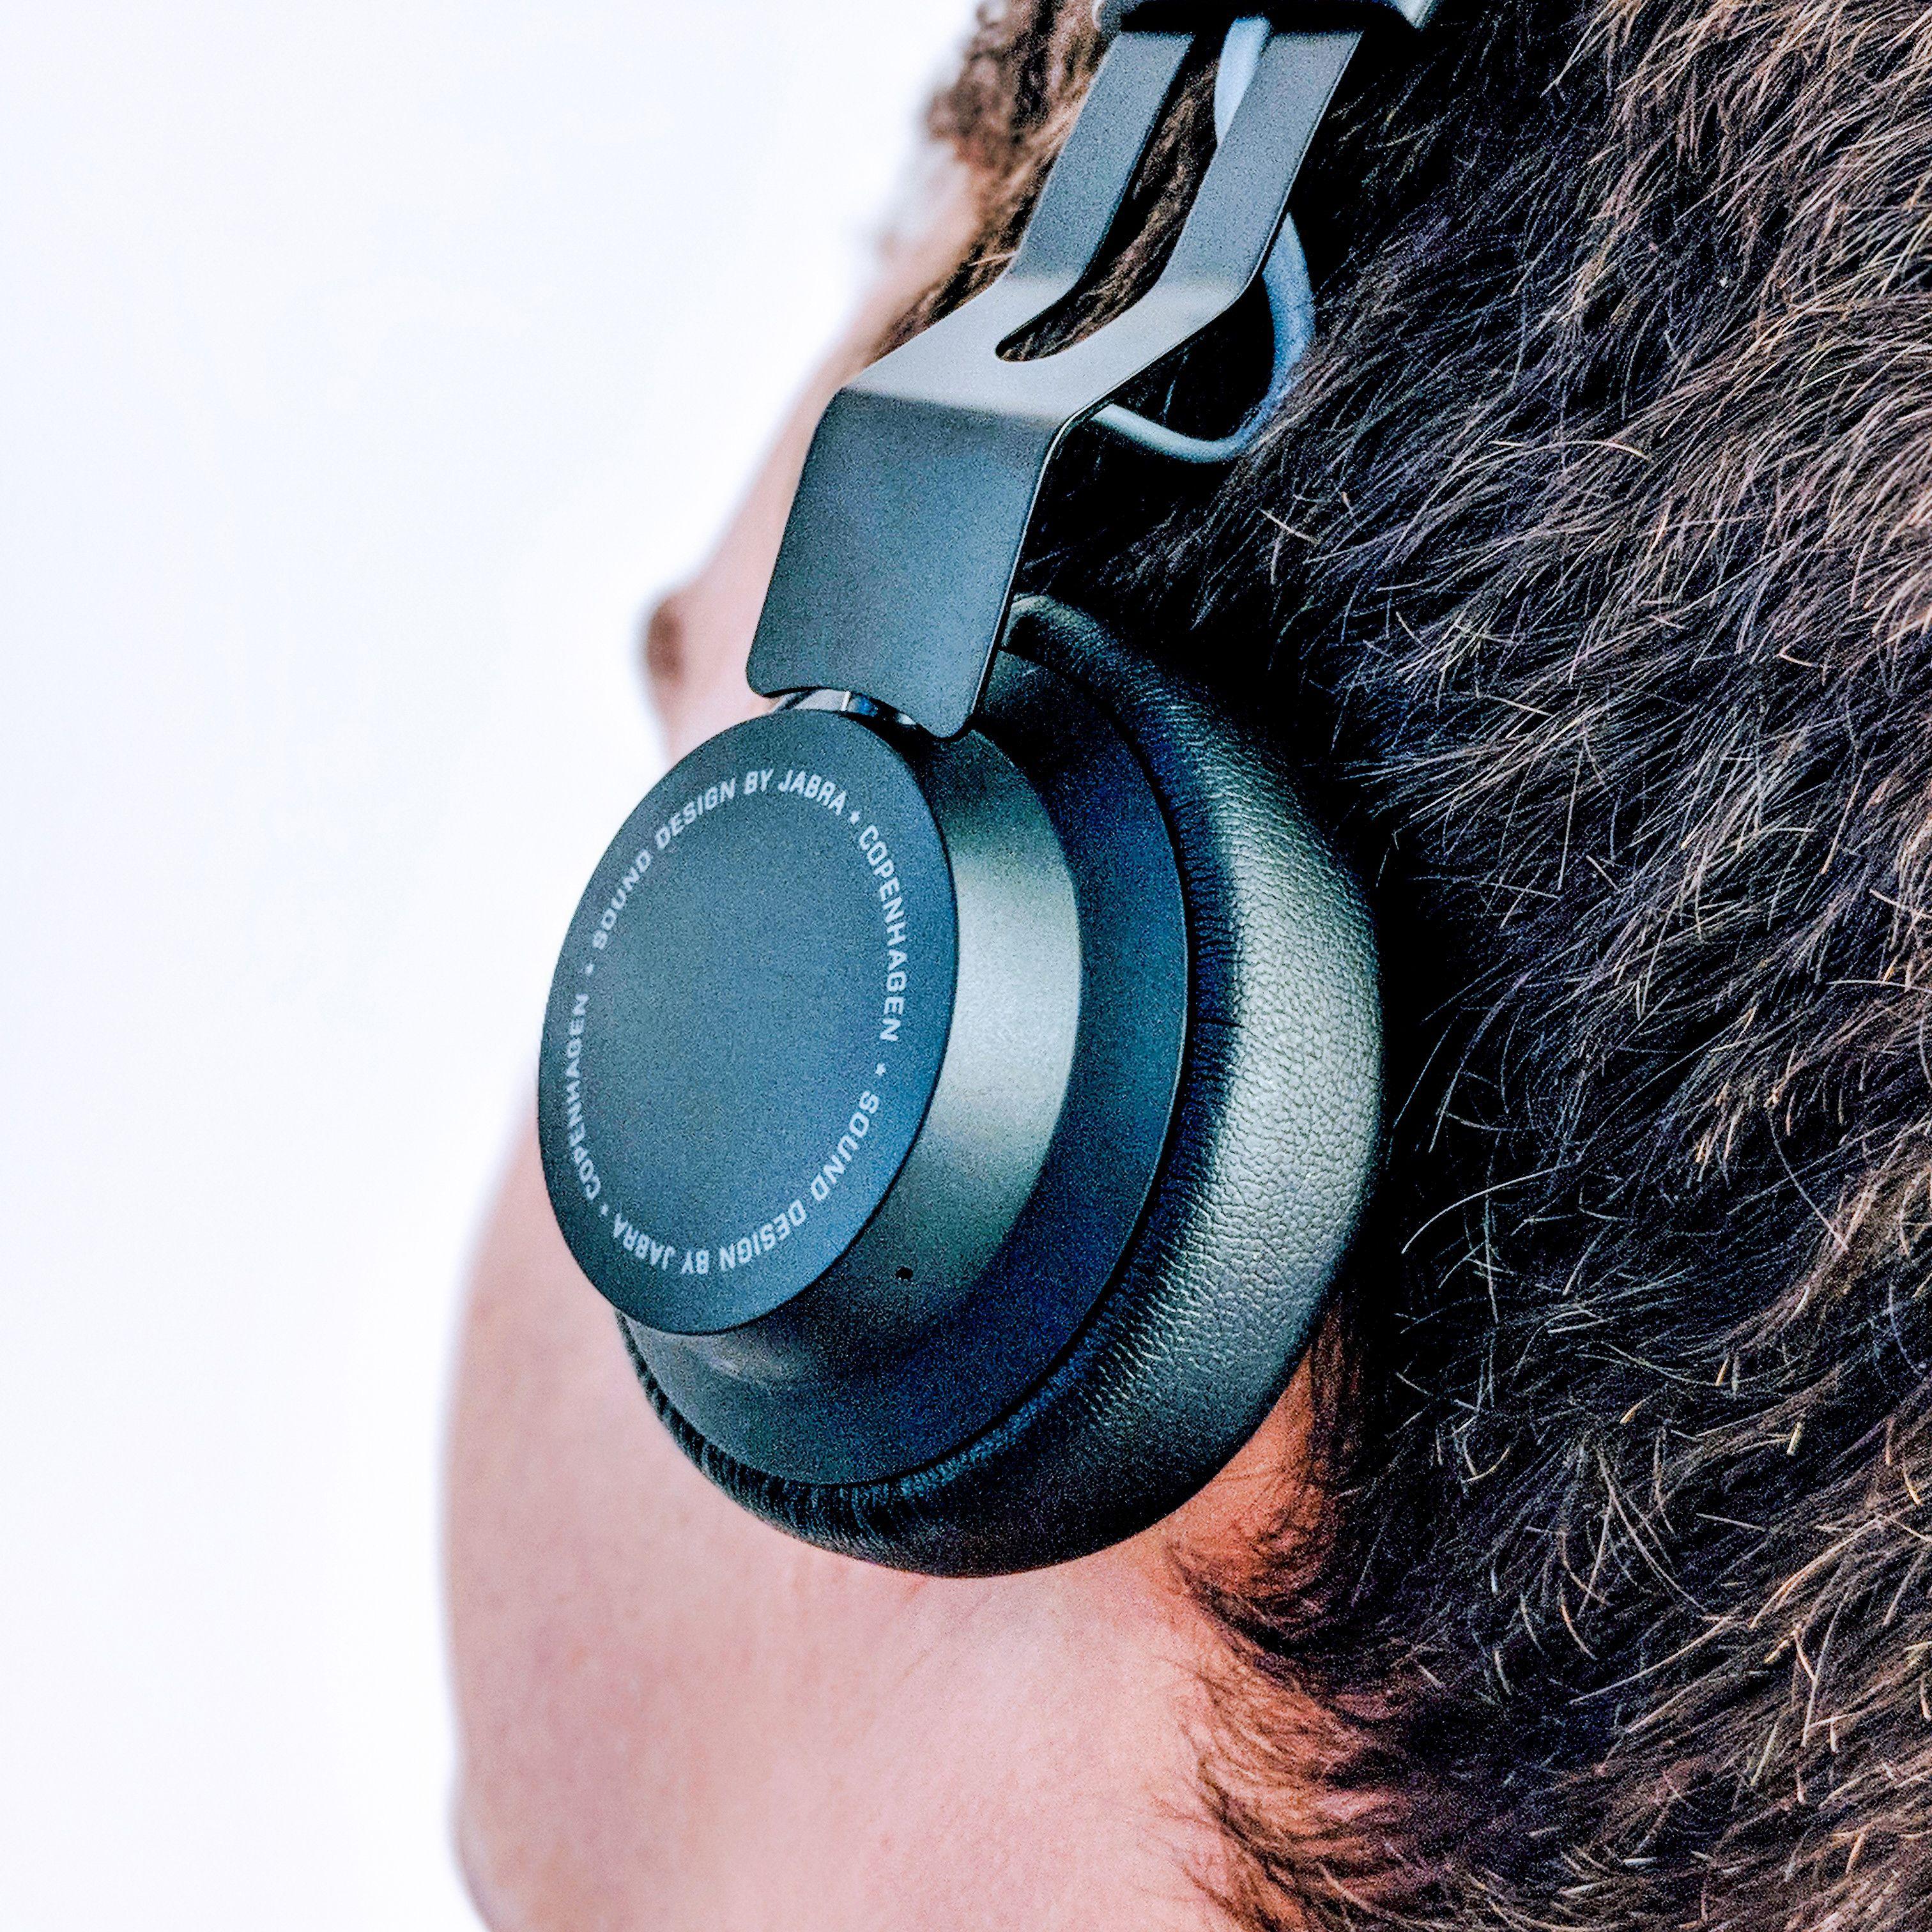 The 14 Best Wireless Bluetooth Headphones to Buy in 2018